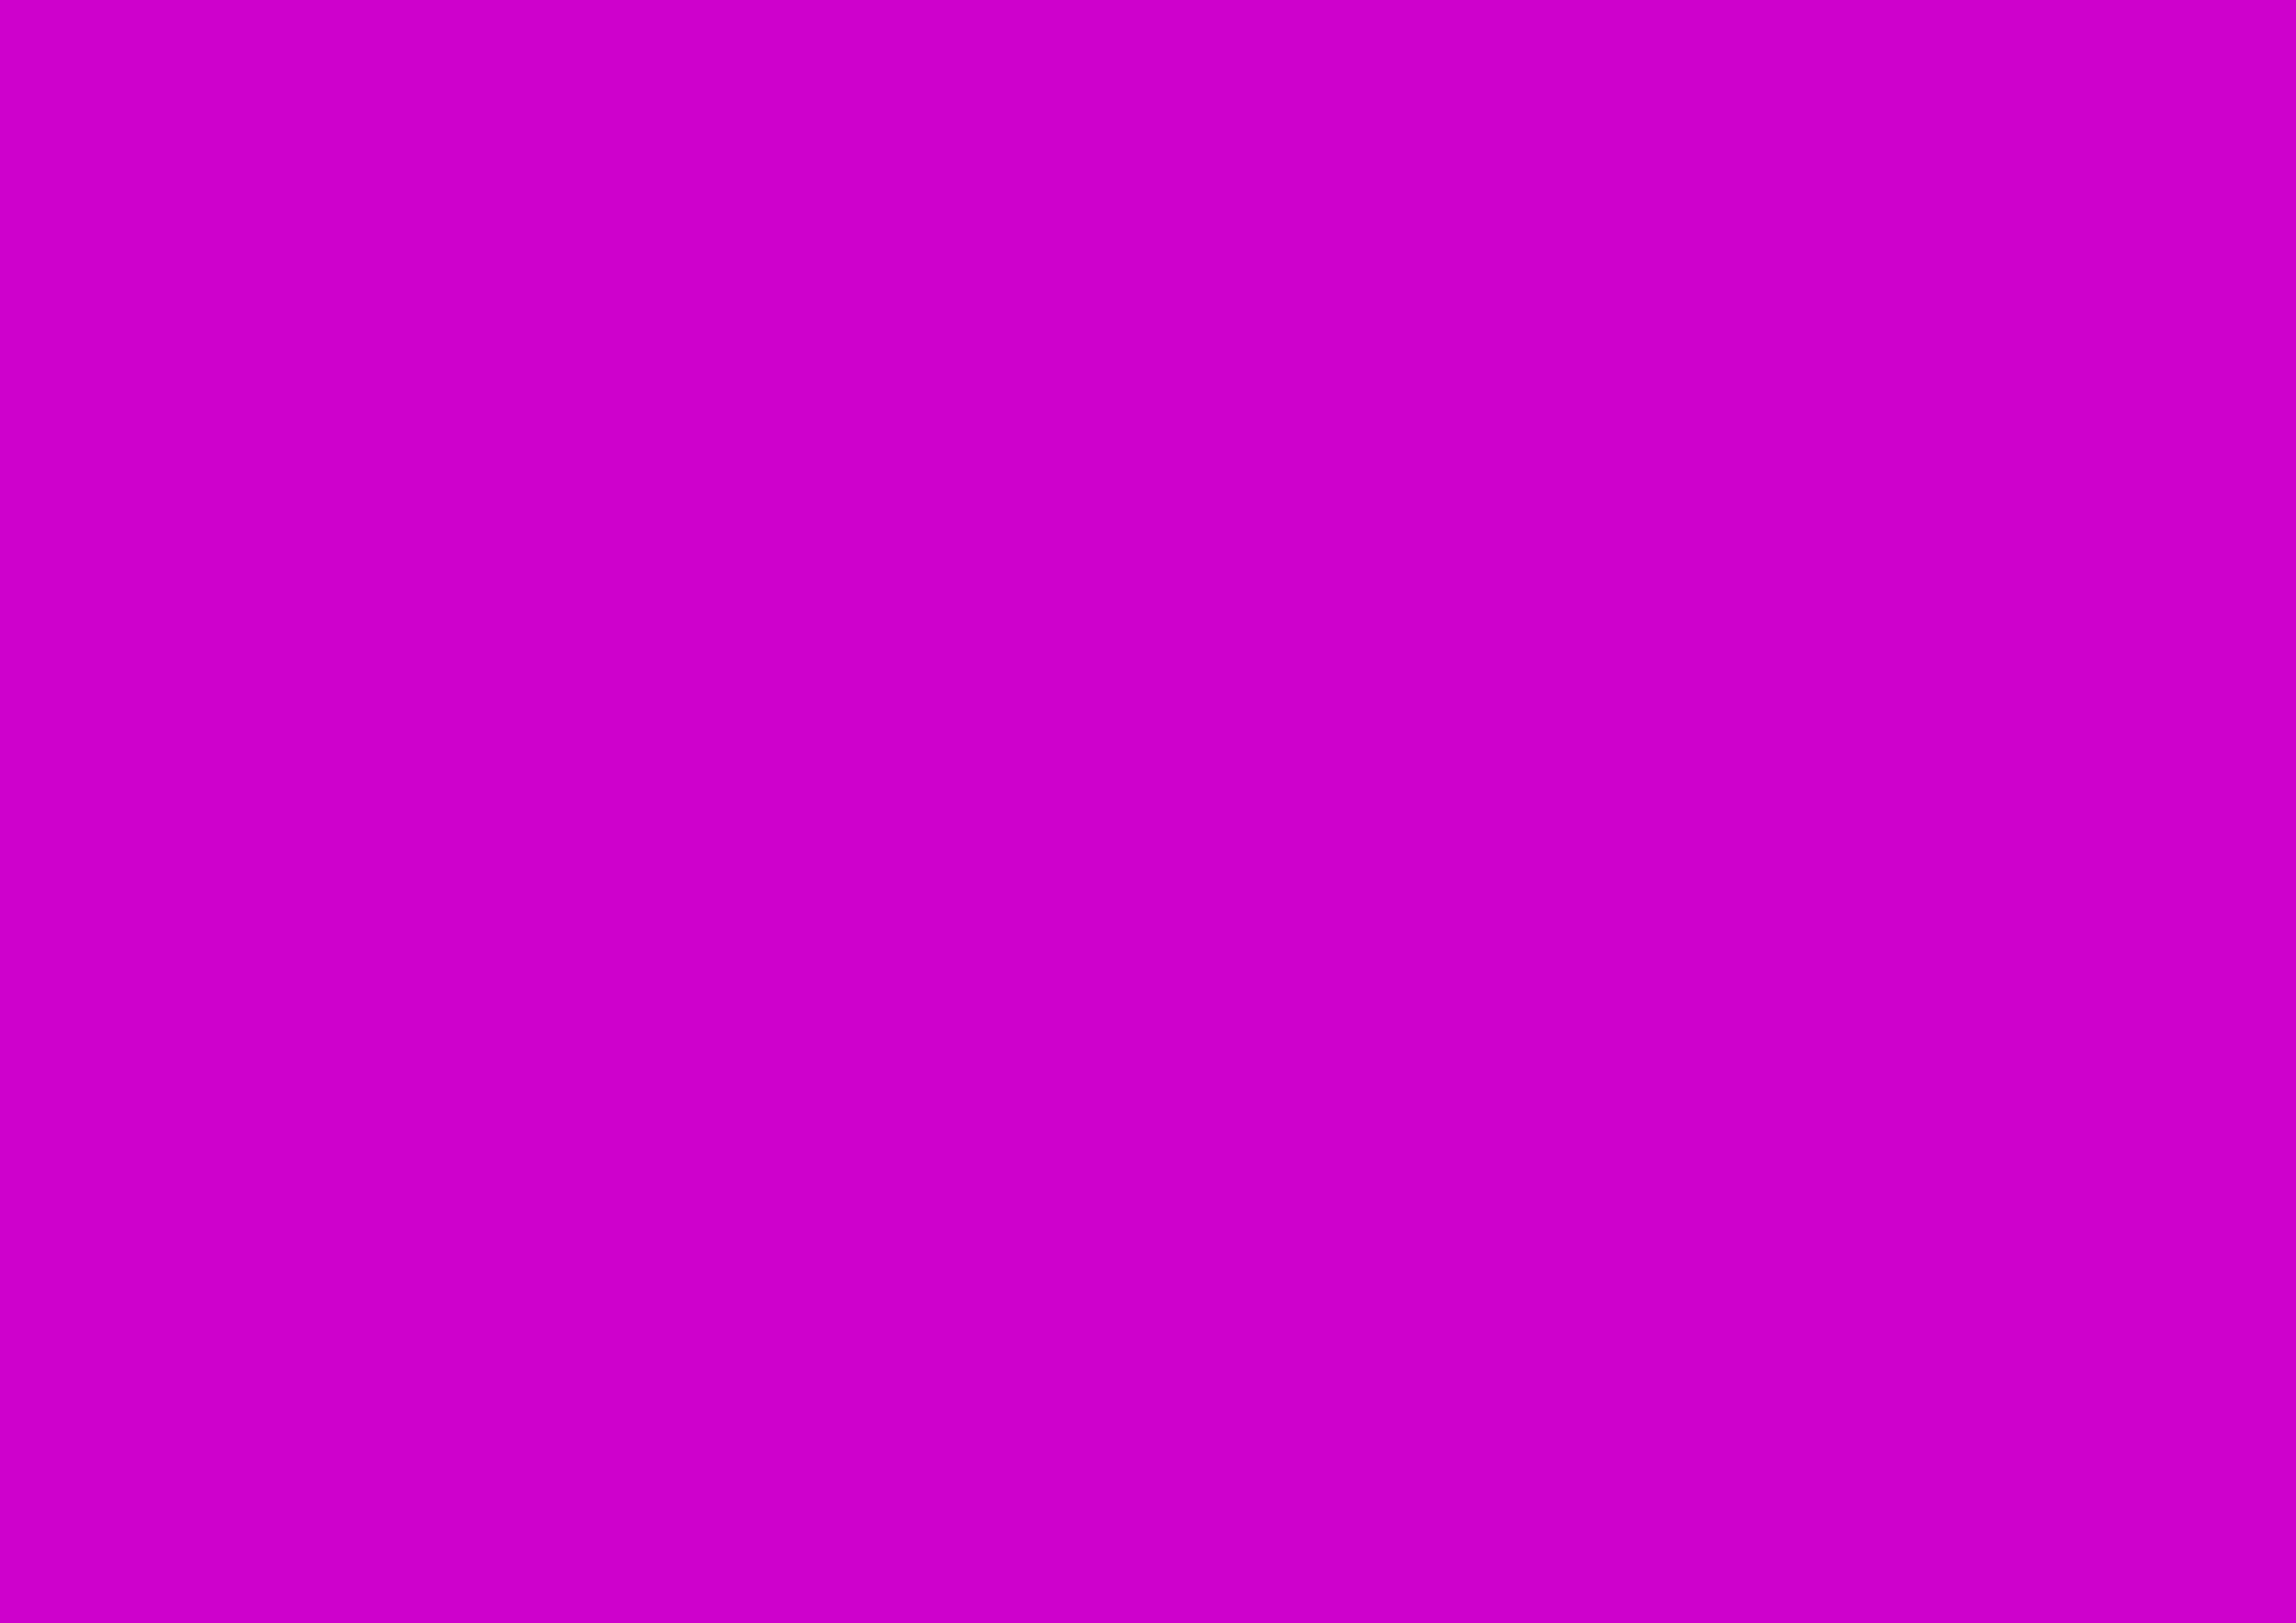 3508x2480 Deep Magenta Solid Color Background